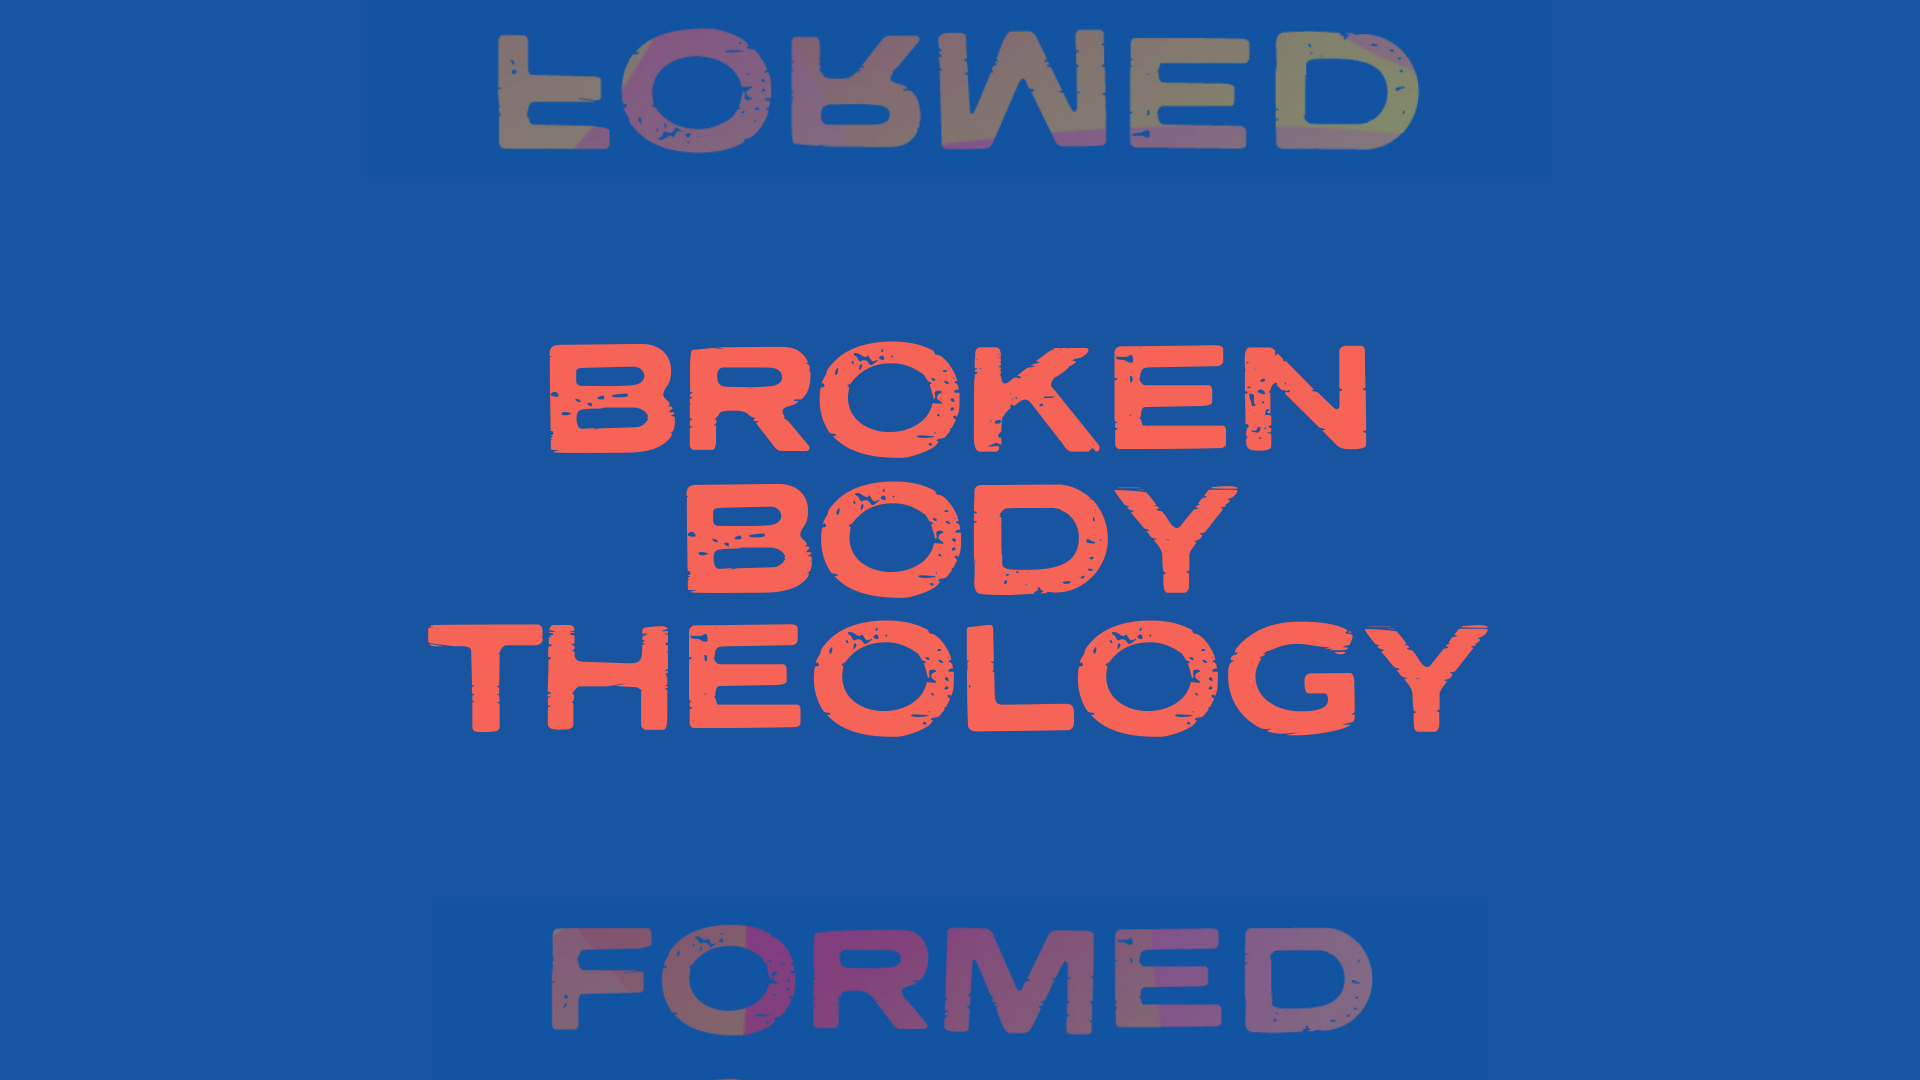 Broken Body Theology